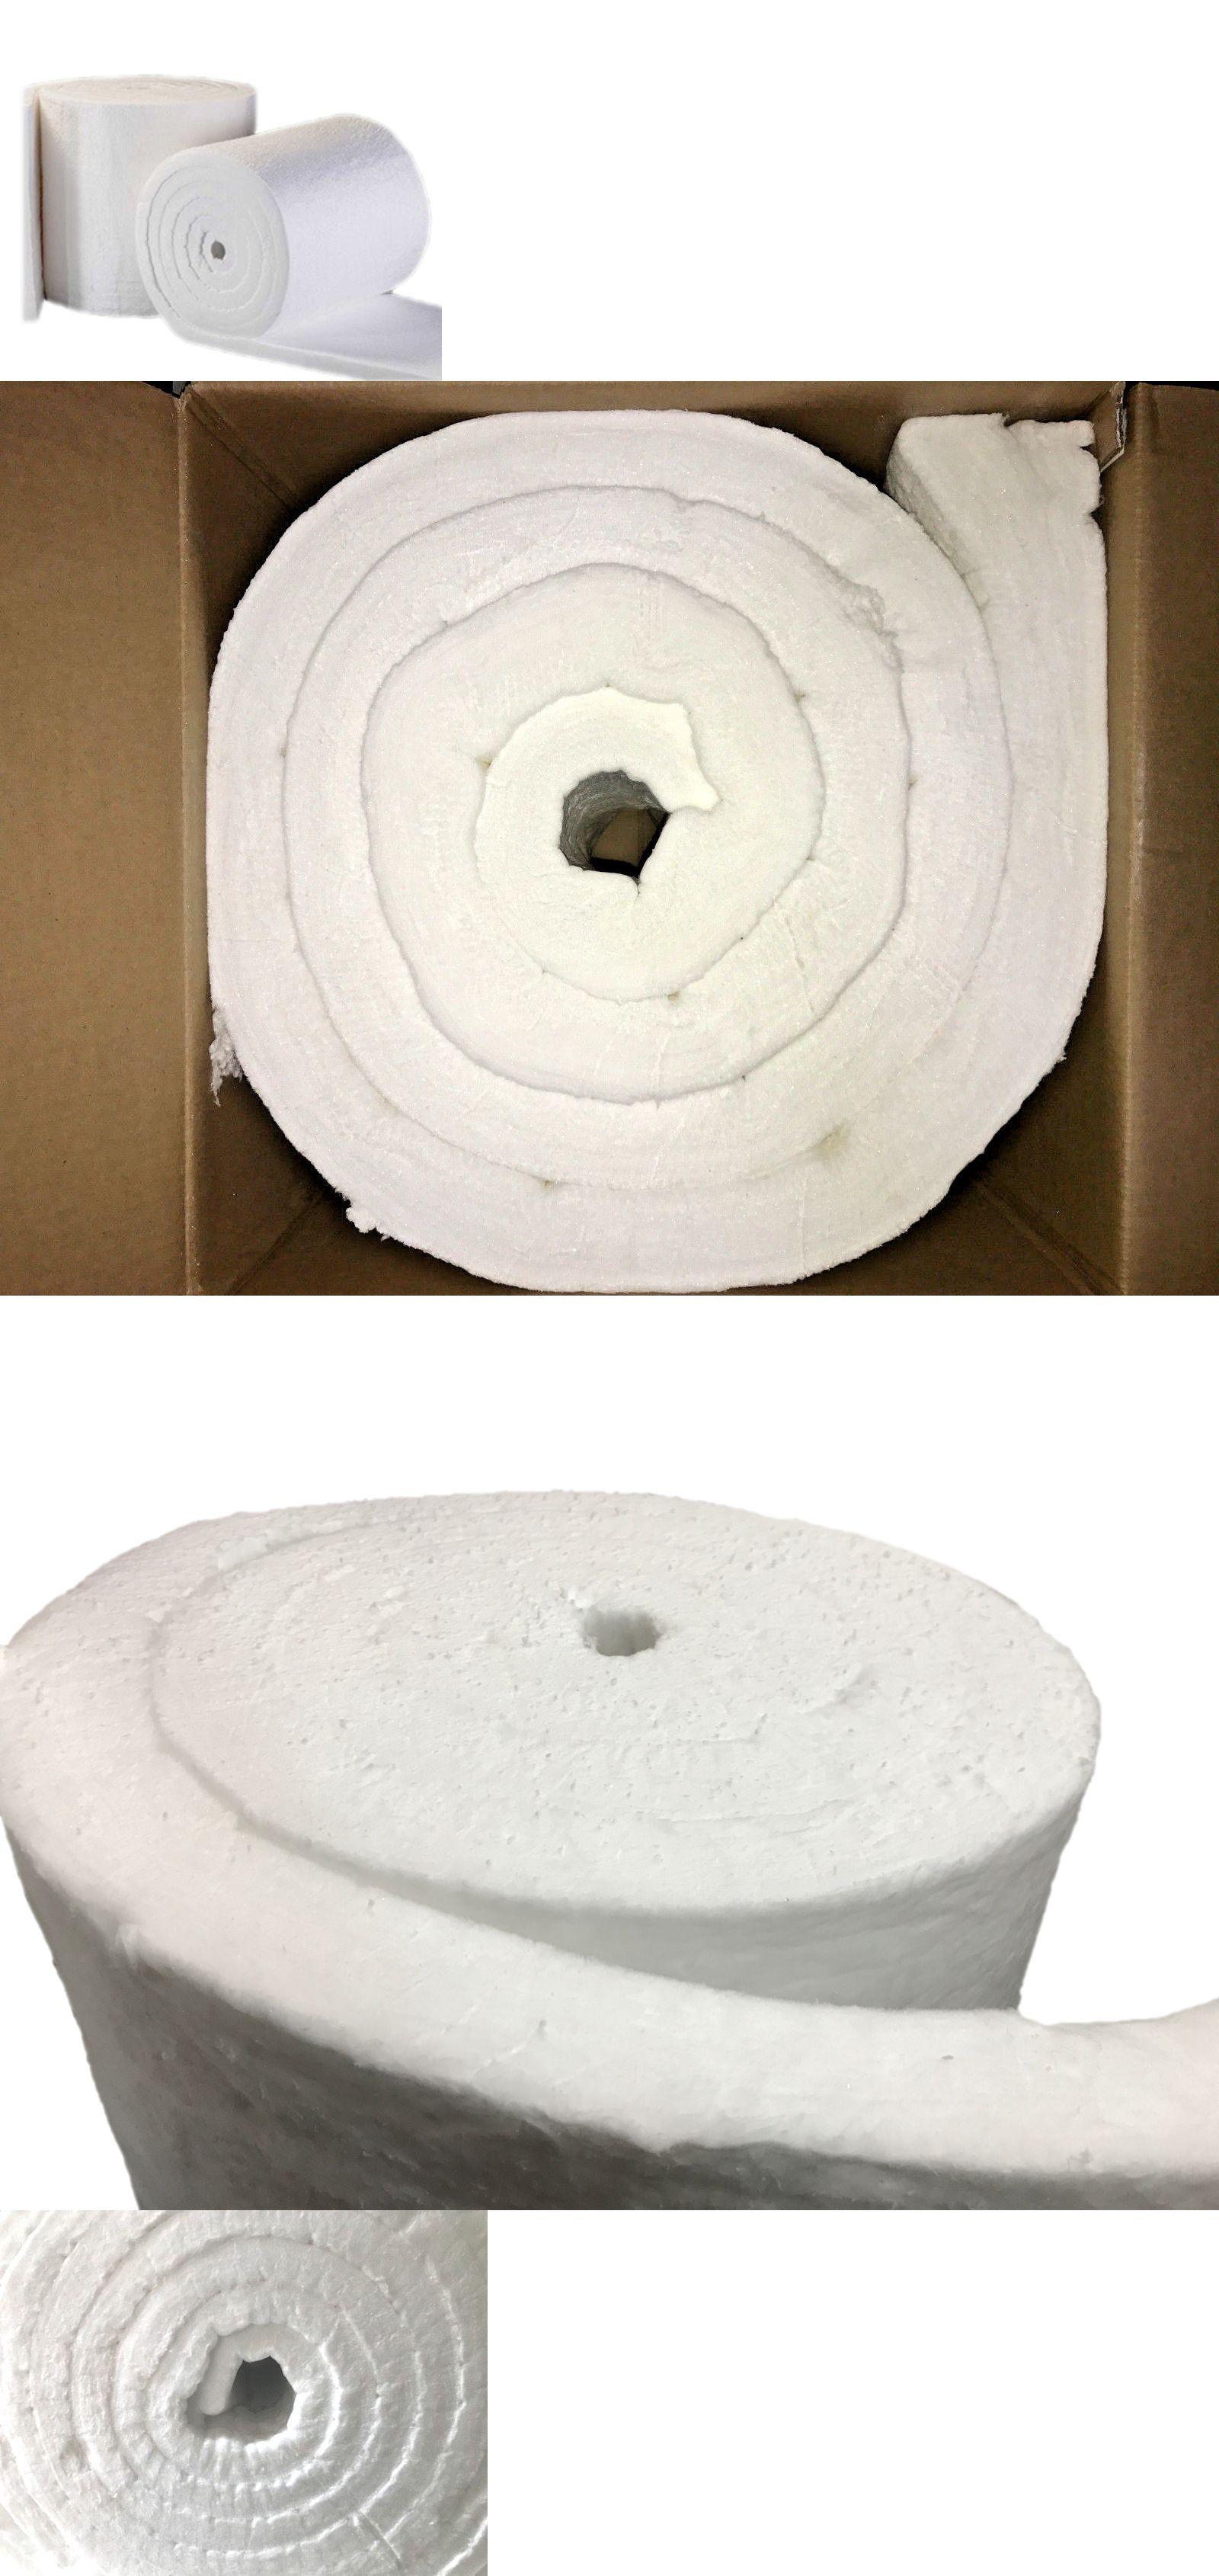 Ceramic Fiber Insulation Blanket 2600f 6lb 1 X24 X25 For Furnace Kiln Forge 688945553197 Ebay Fiber Insulation Ceramic Fiber Blanket Ceramic Fiber